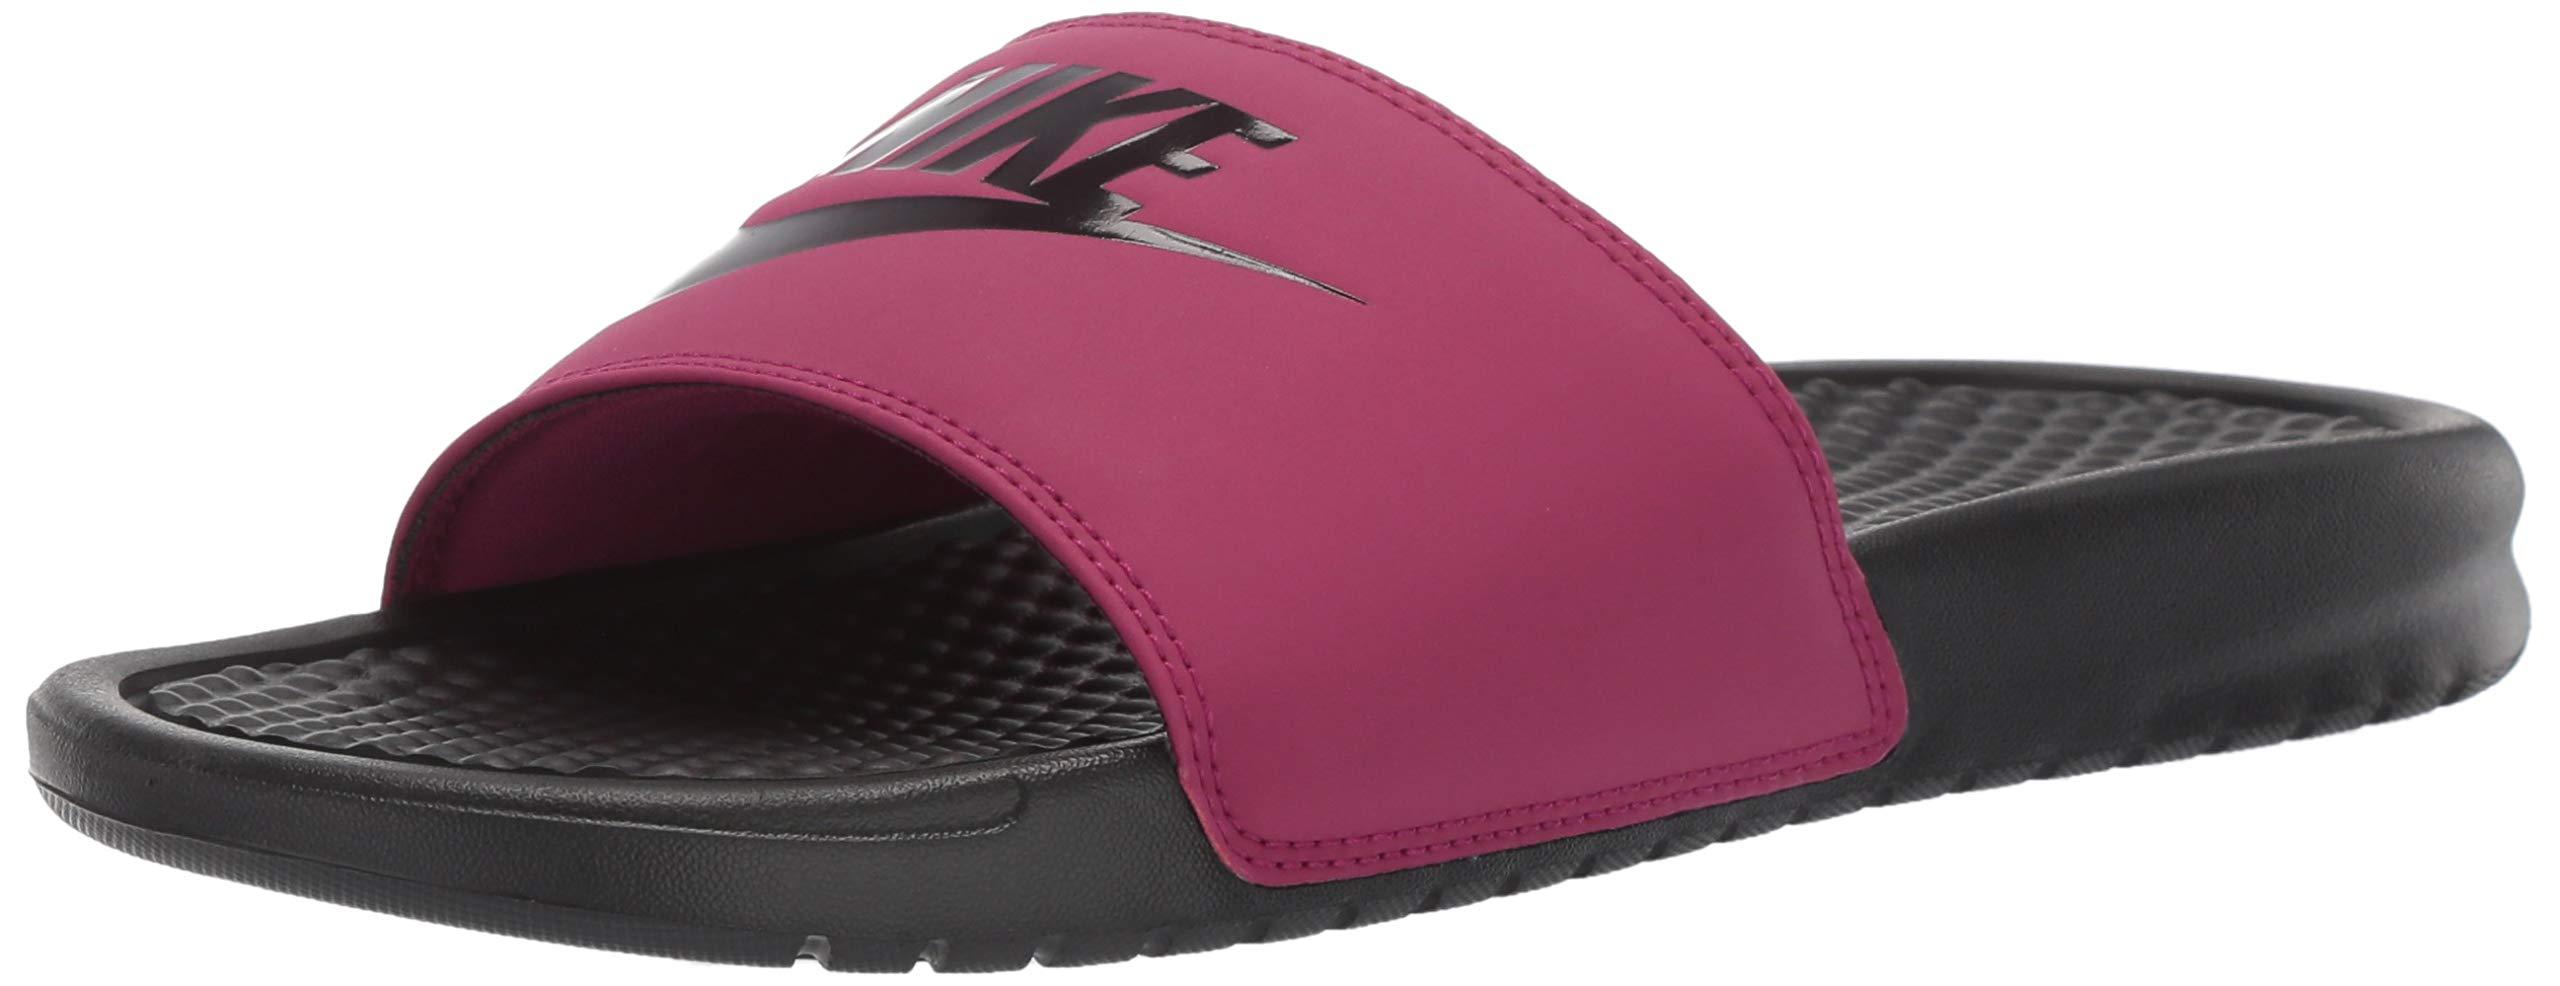 Nike Women's Benassi Just Do It Sandal, True Berry/Burgundy ash, 7 Regular US